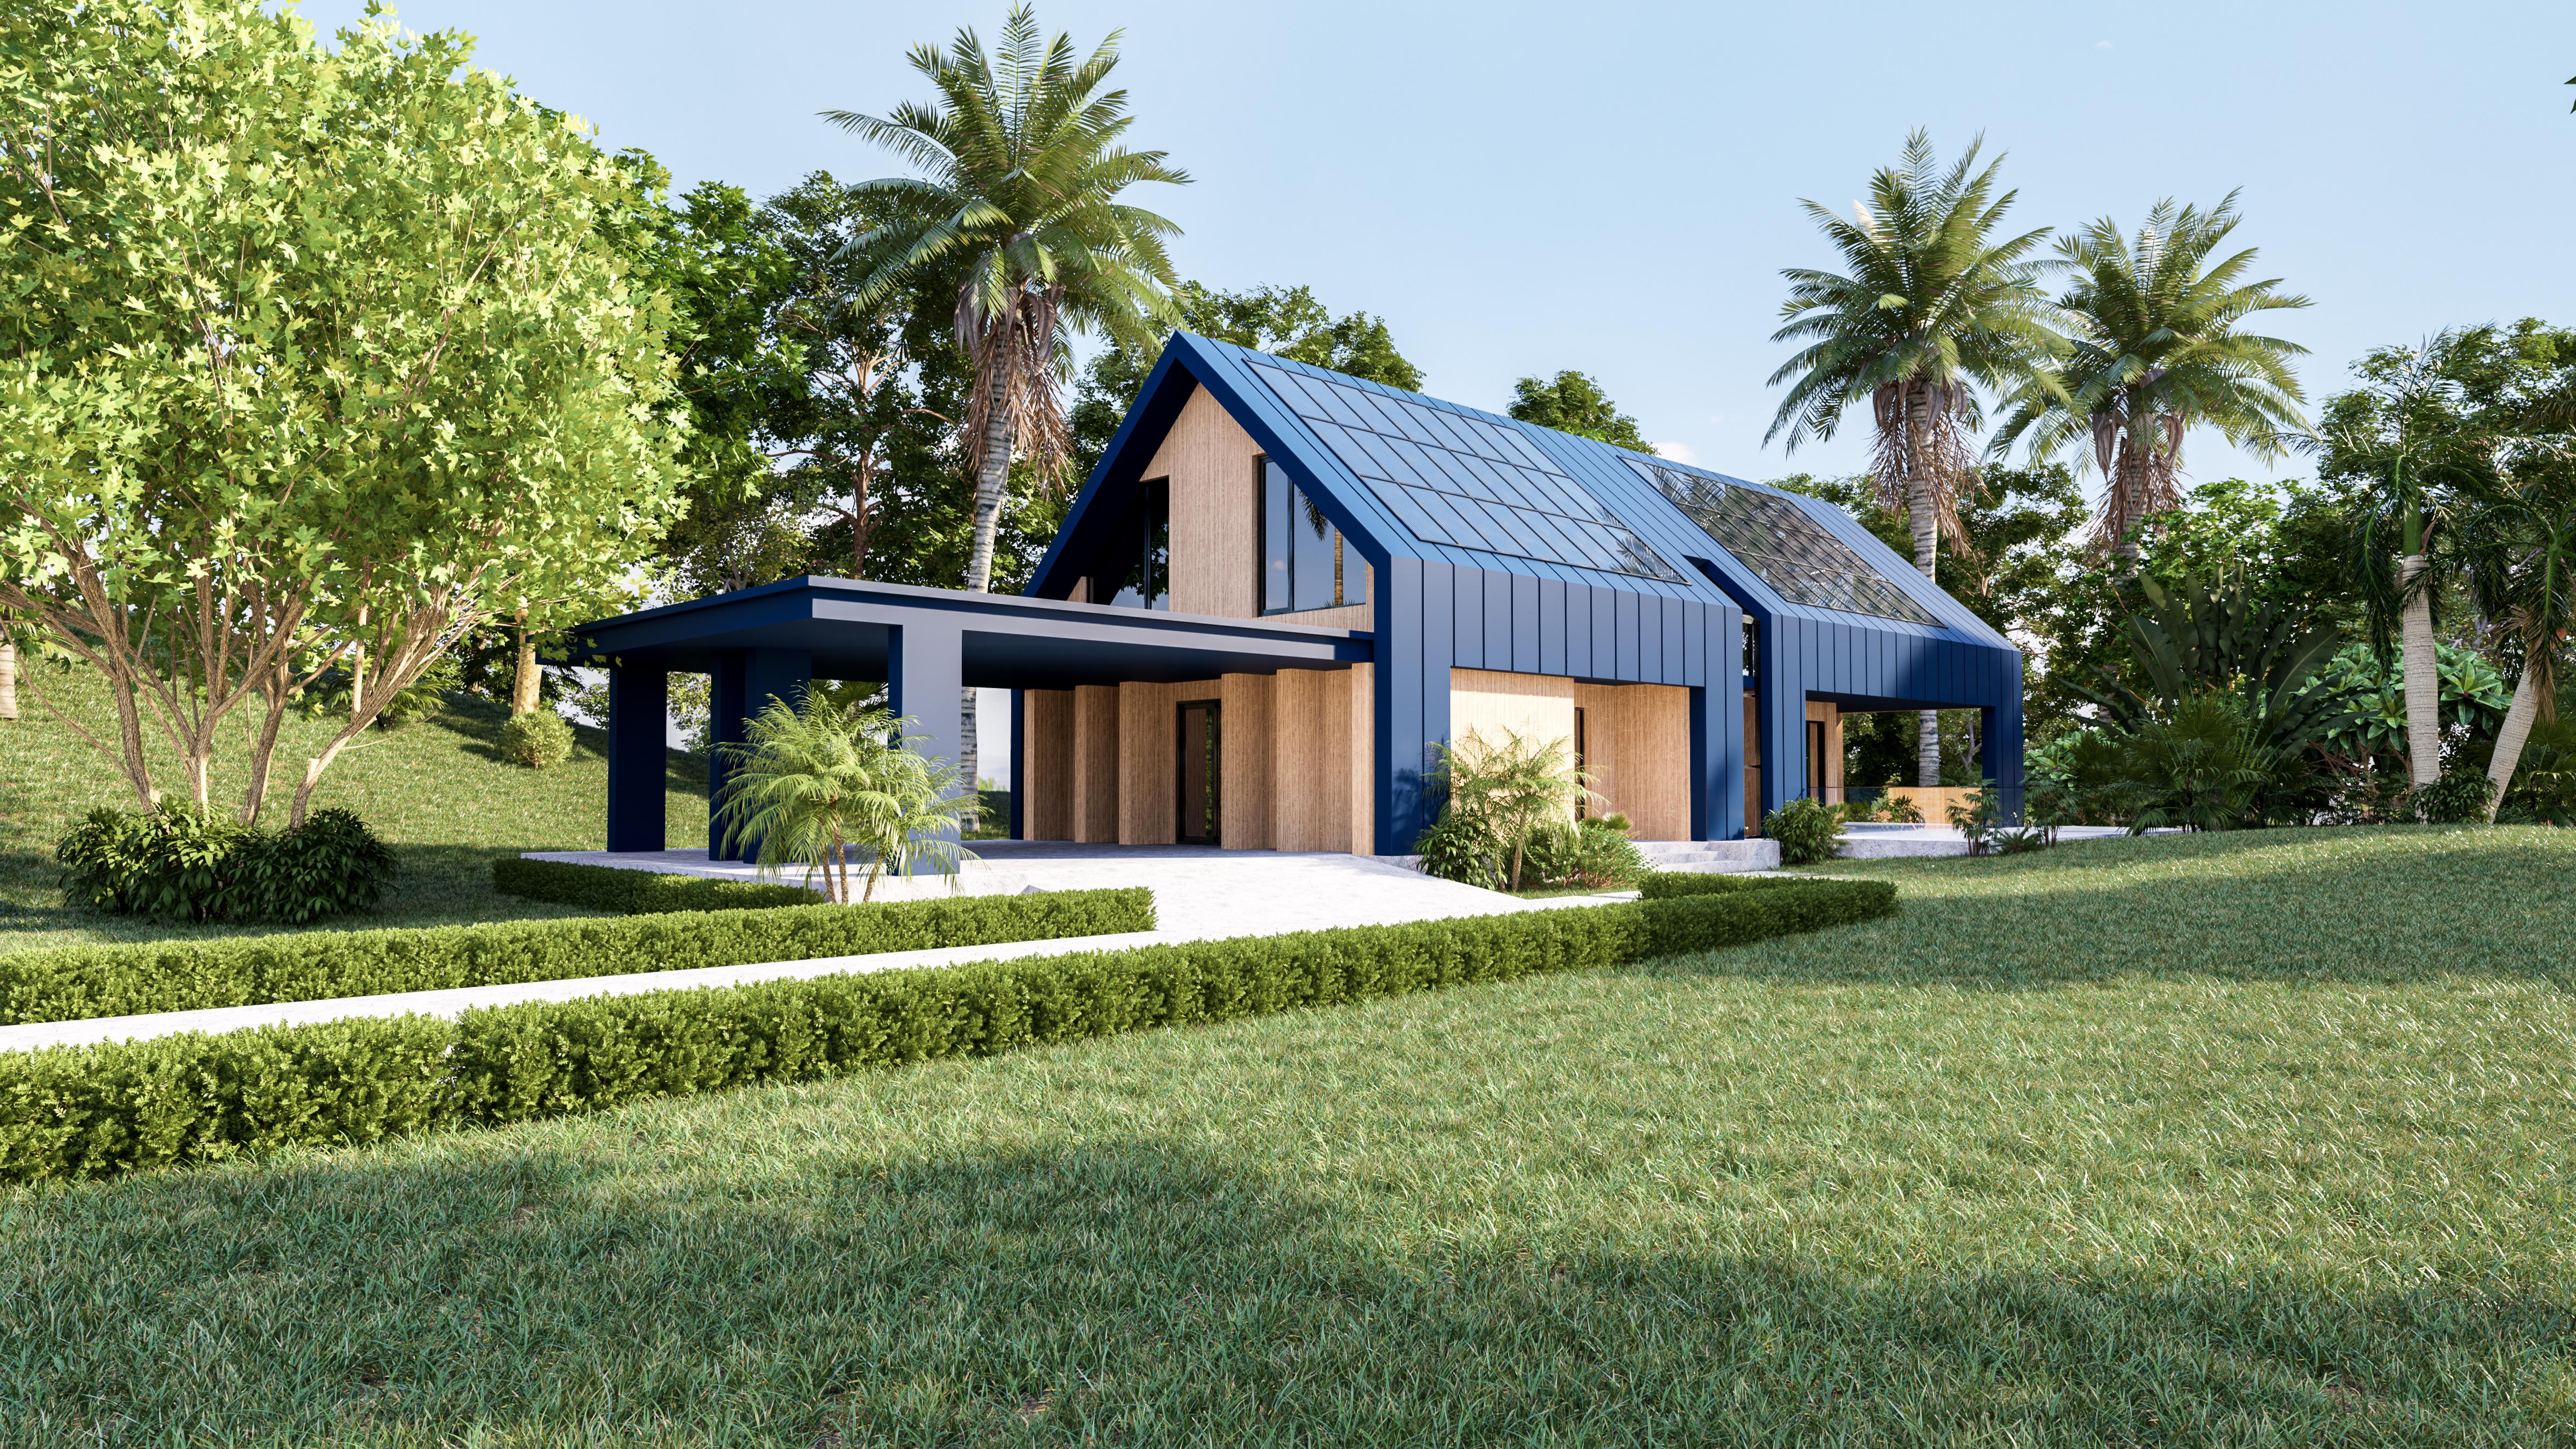 solar-panels-roof-modern-house-harvesting-renewable-energy-with-solar-cell-panels-exterior-design-3d-rendering.jpg